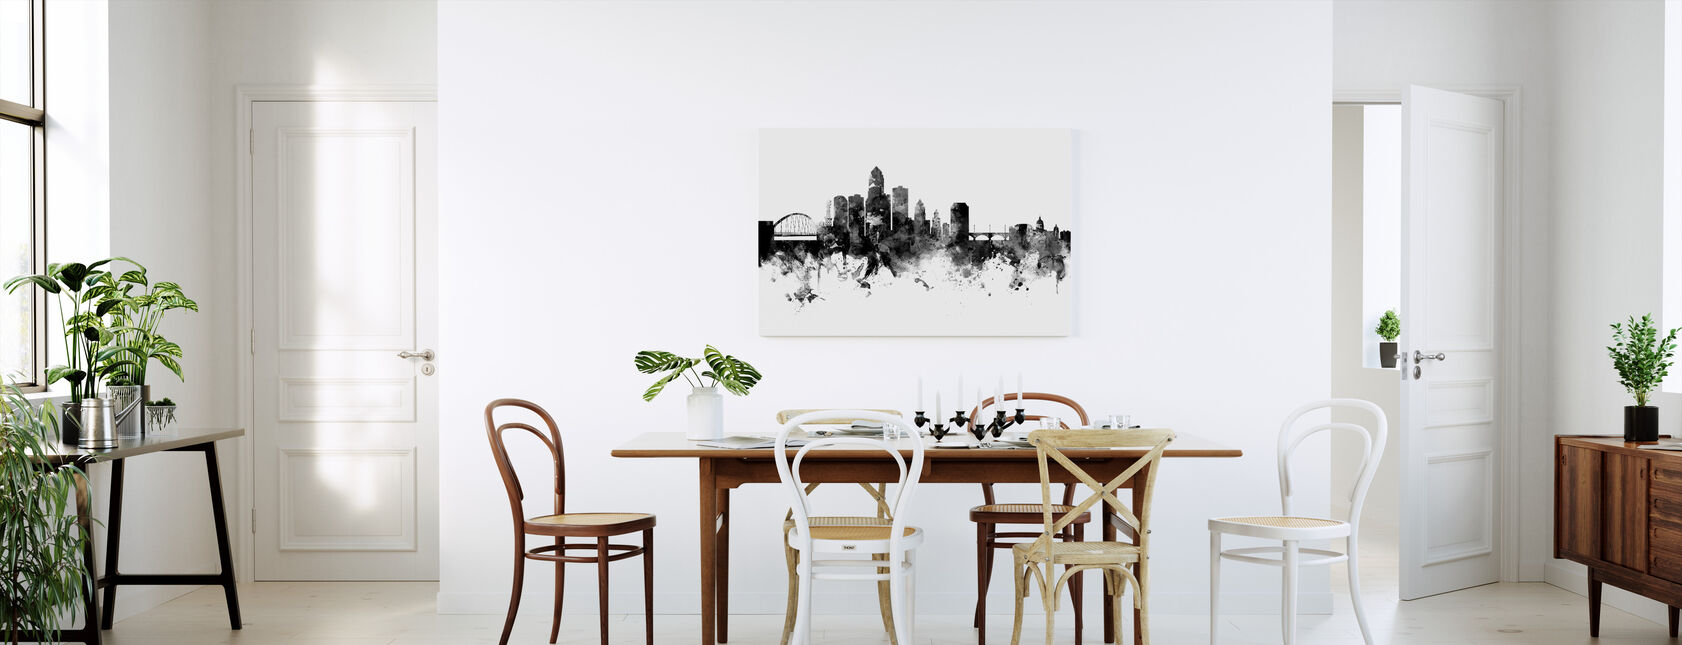 Des Moines Iowa Skyline, black and white - Canvas print - Kitchen